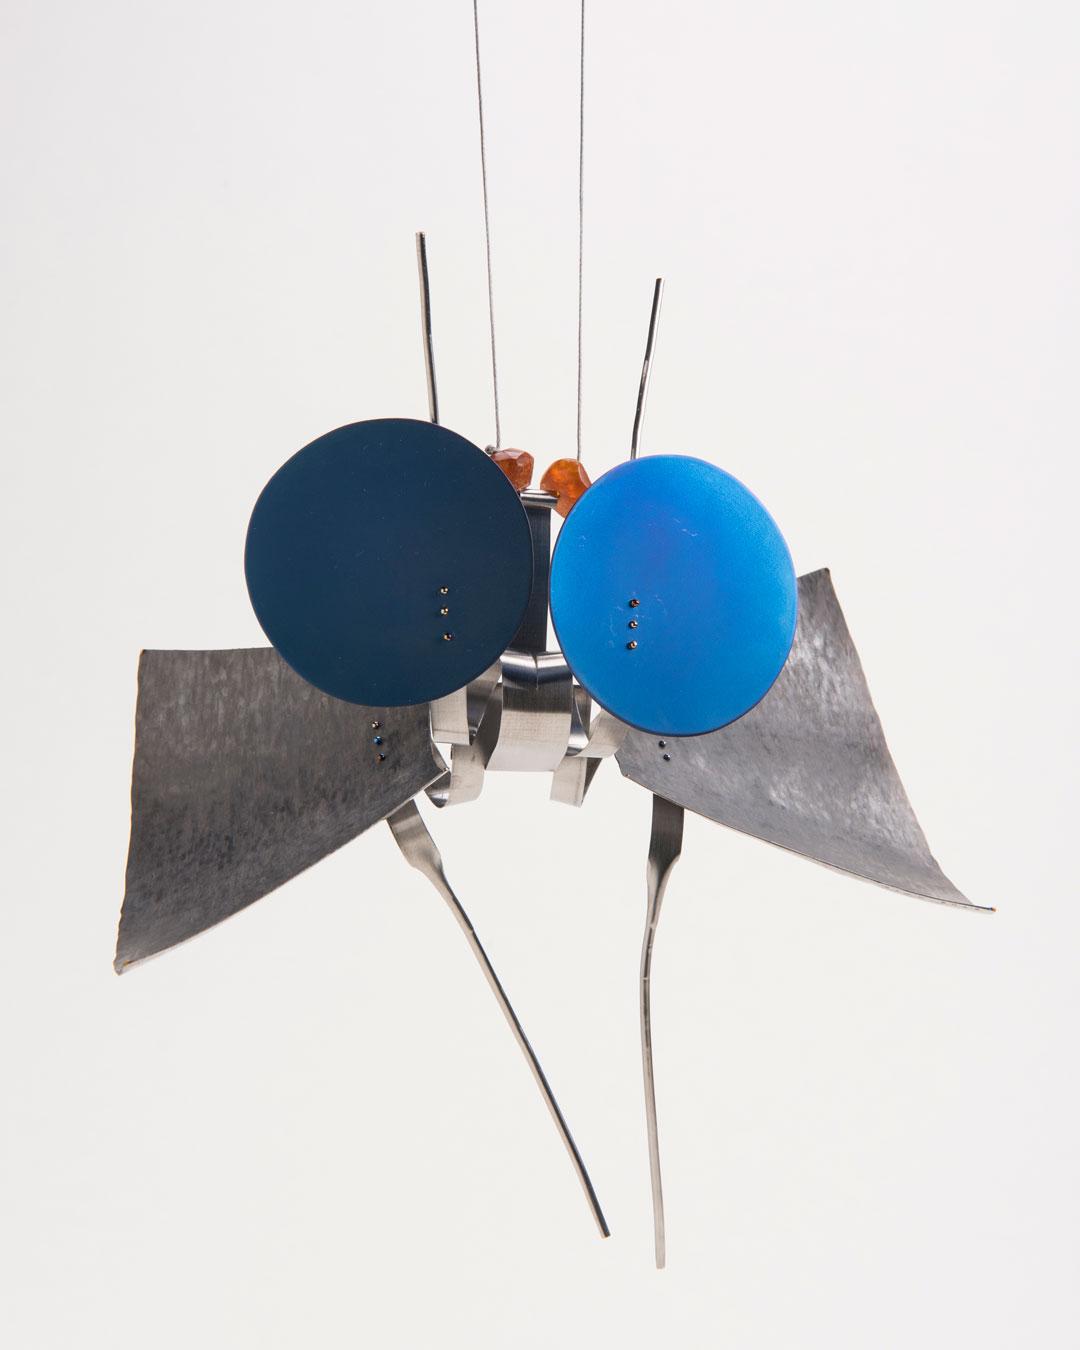 Andrea Wippermann, Eriocrania Semipurpurella, 2018, pendant; stainless steel, titanium, amber, nylon, blackened silver, 110 x 120 x 35 mm, €2450